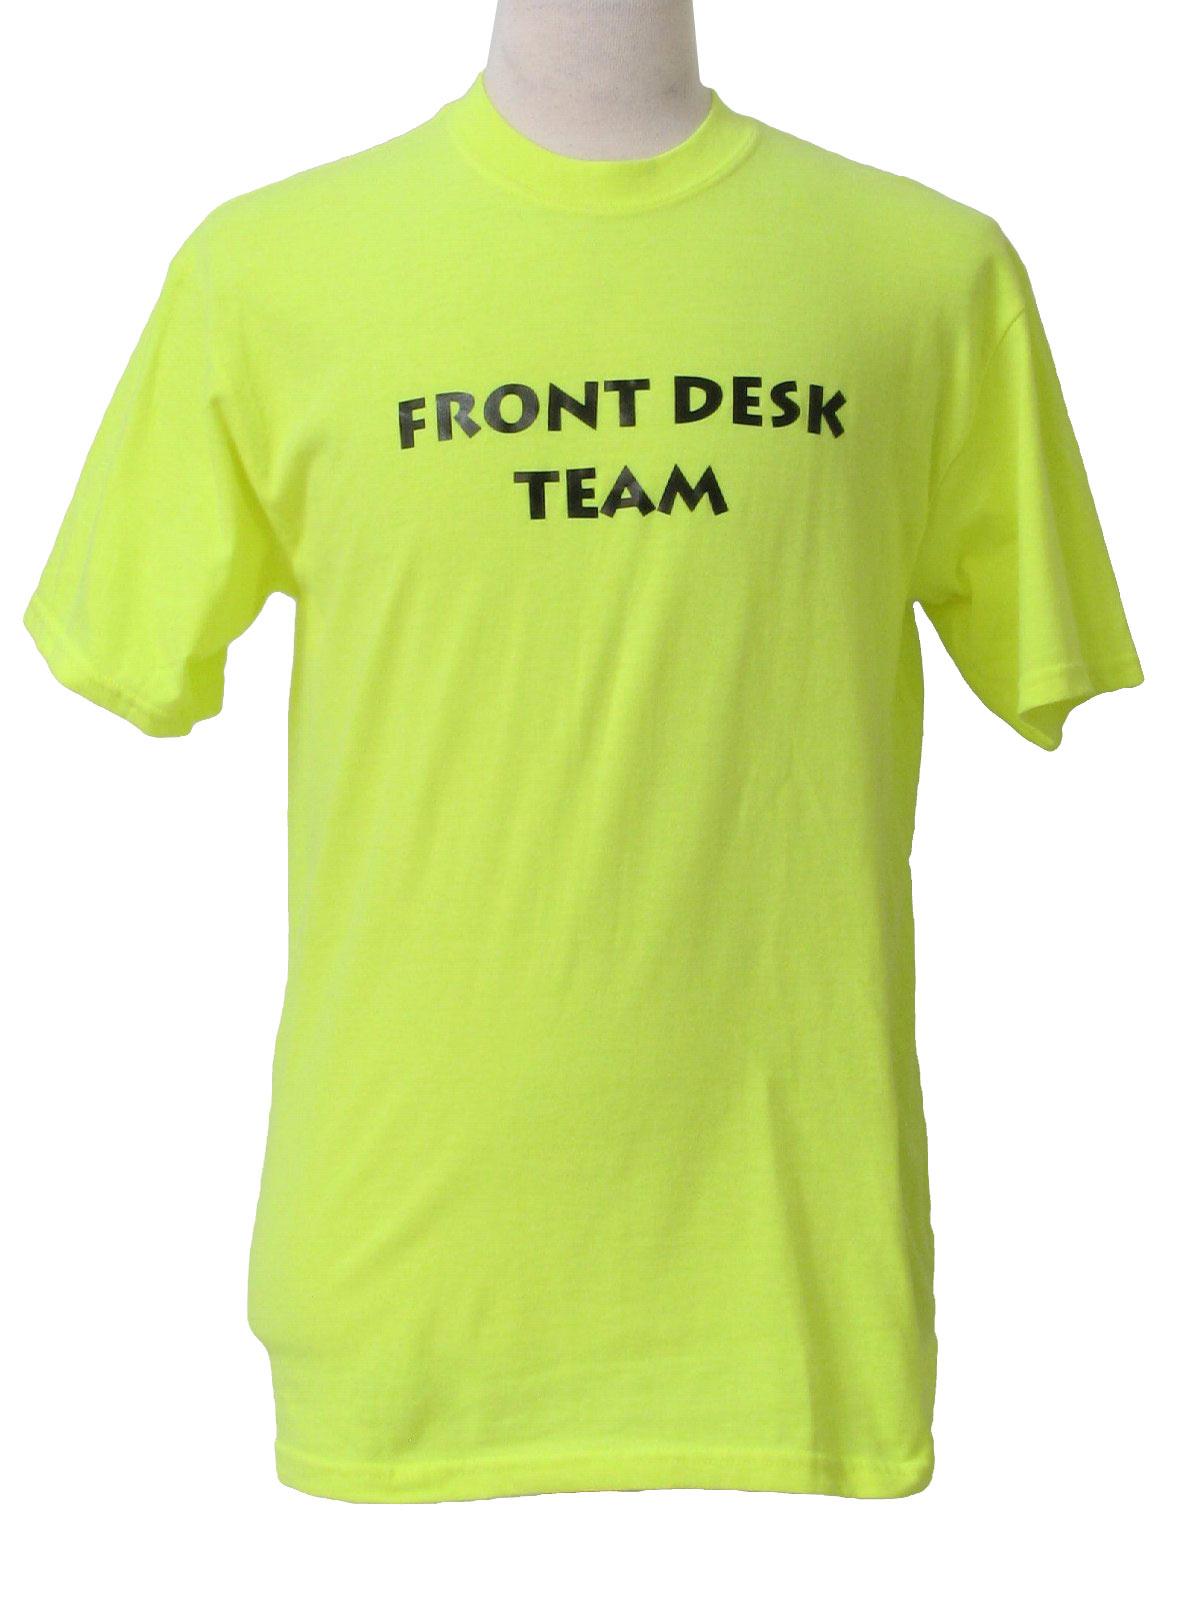 80 39 S Vintage T Shirt 80s Gildan Unisex Neon Yellow